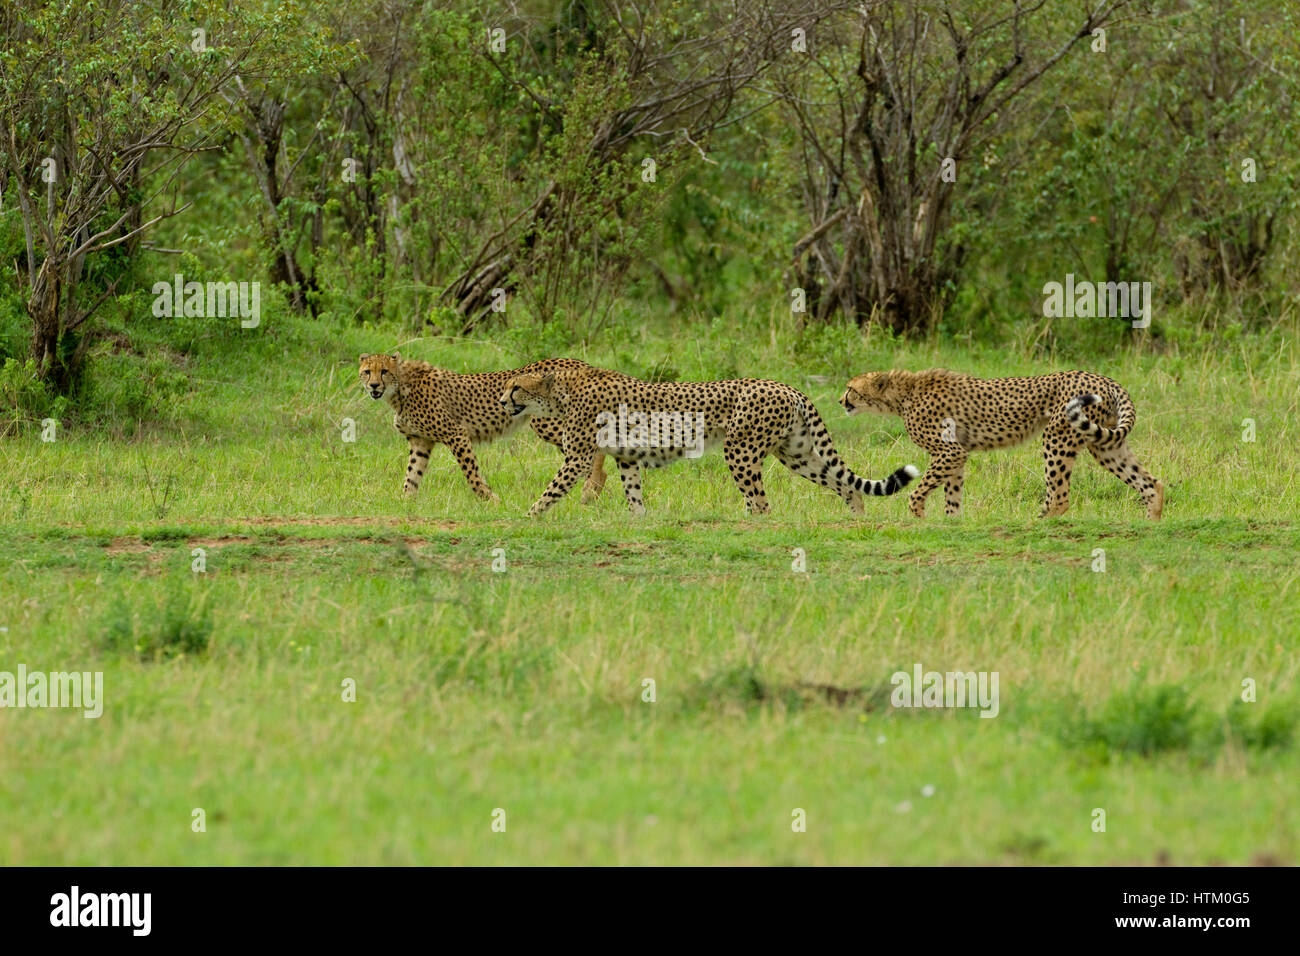 Three Cheetah (Acinonyx jubatus) males on the hunt, Masai Mara National Reserve, Kenya, East Africa Stock Photo